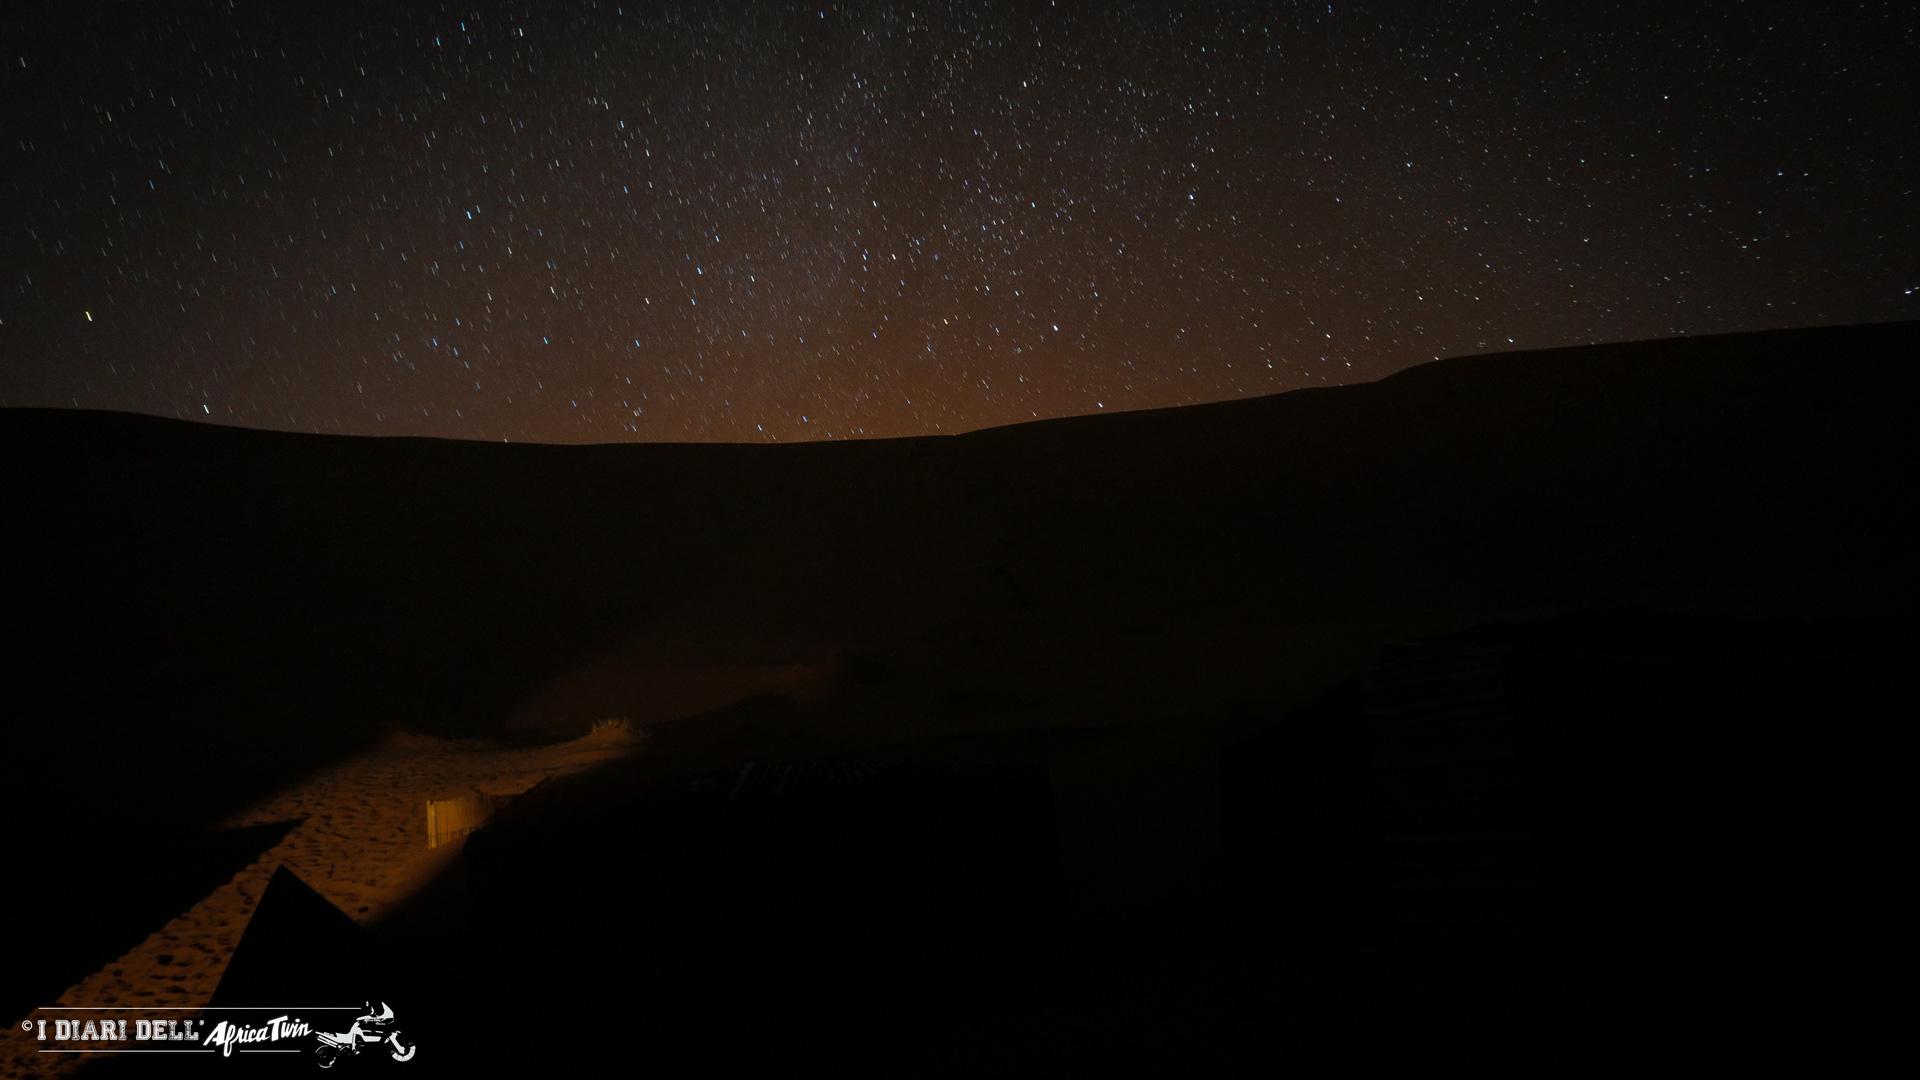 Cielo stellato del Sahara